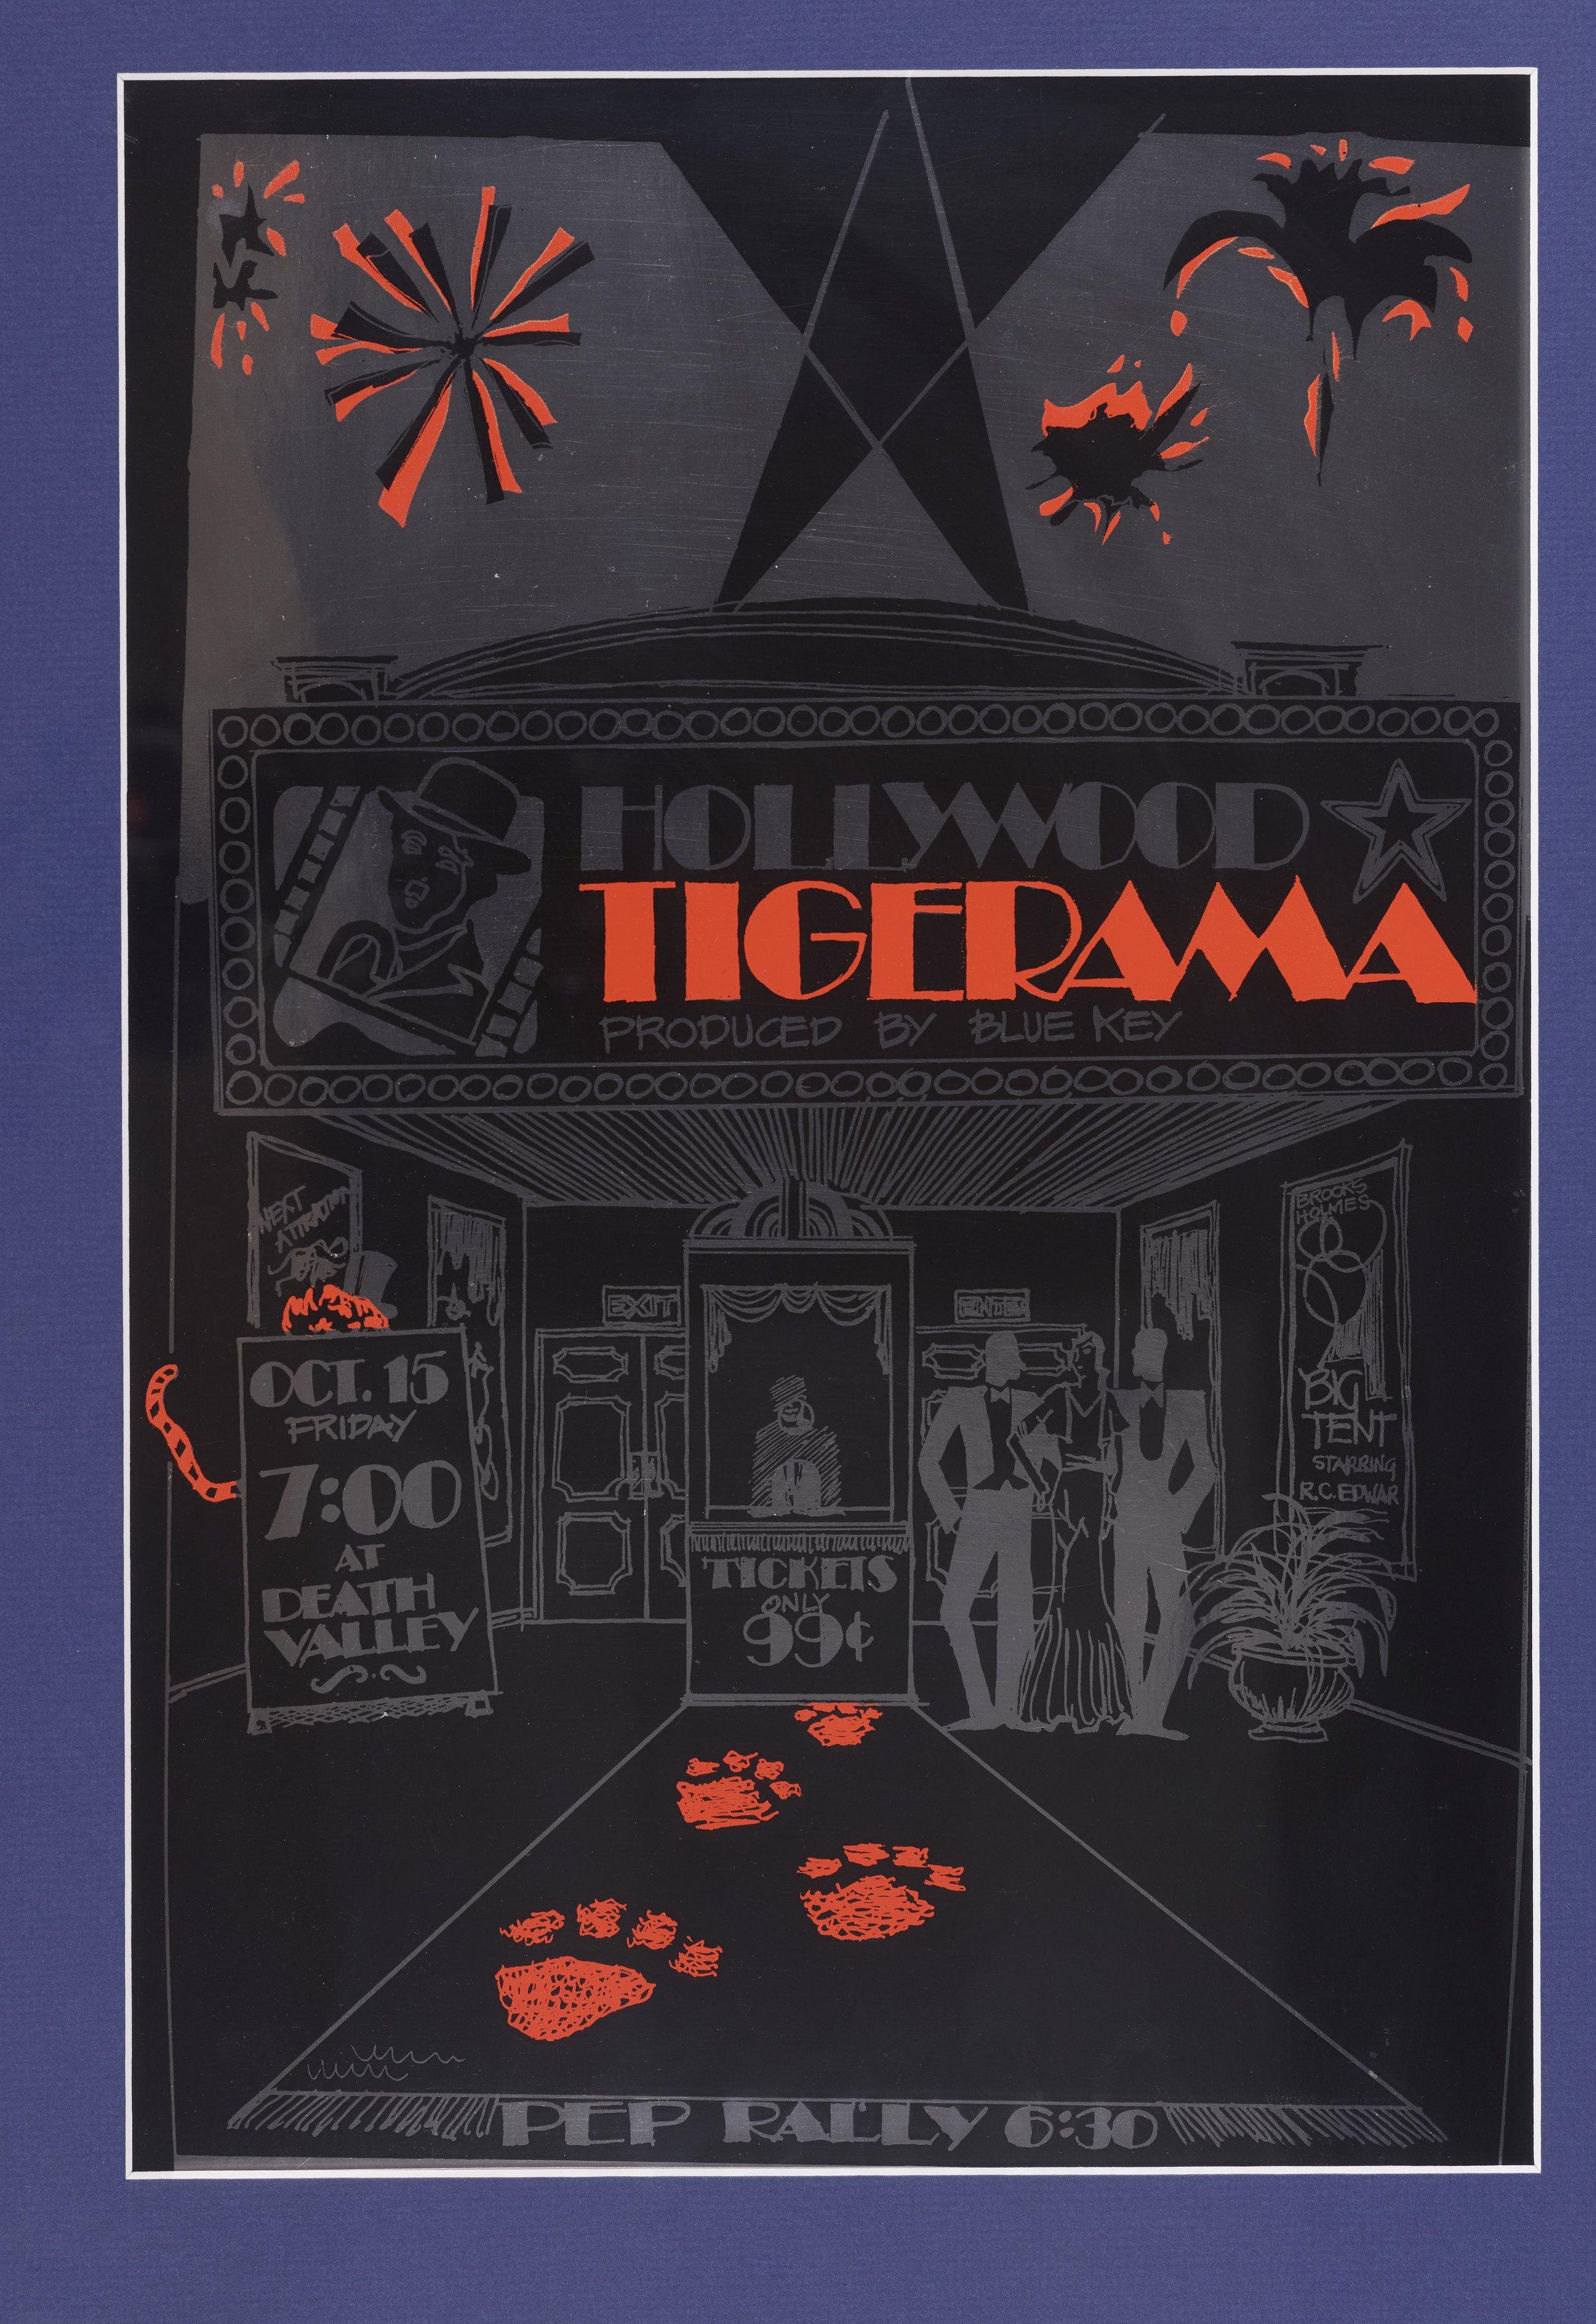 Tigerama 1976